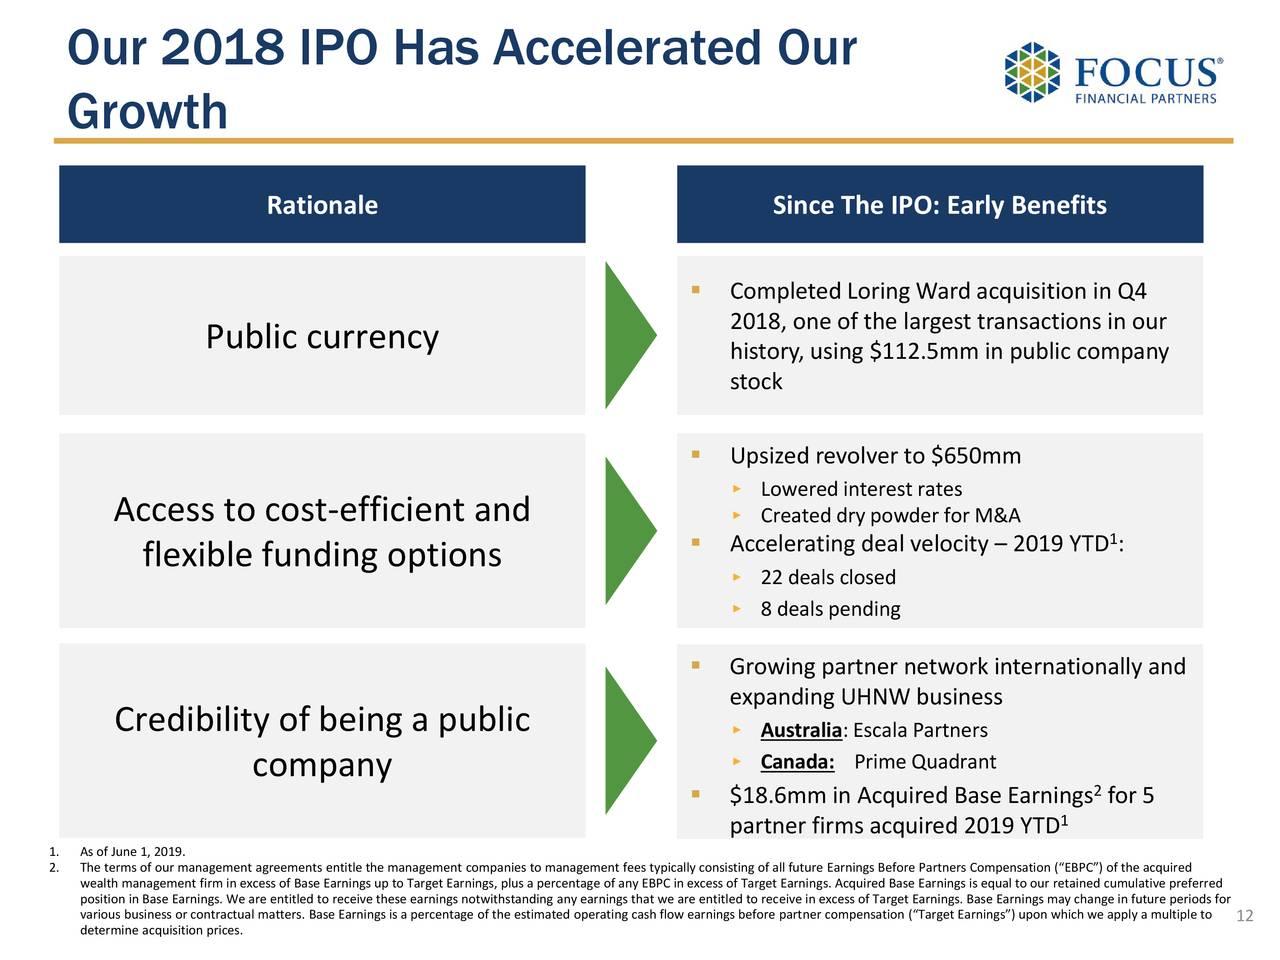 Focus financial partners ipo underwriters